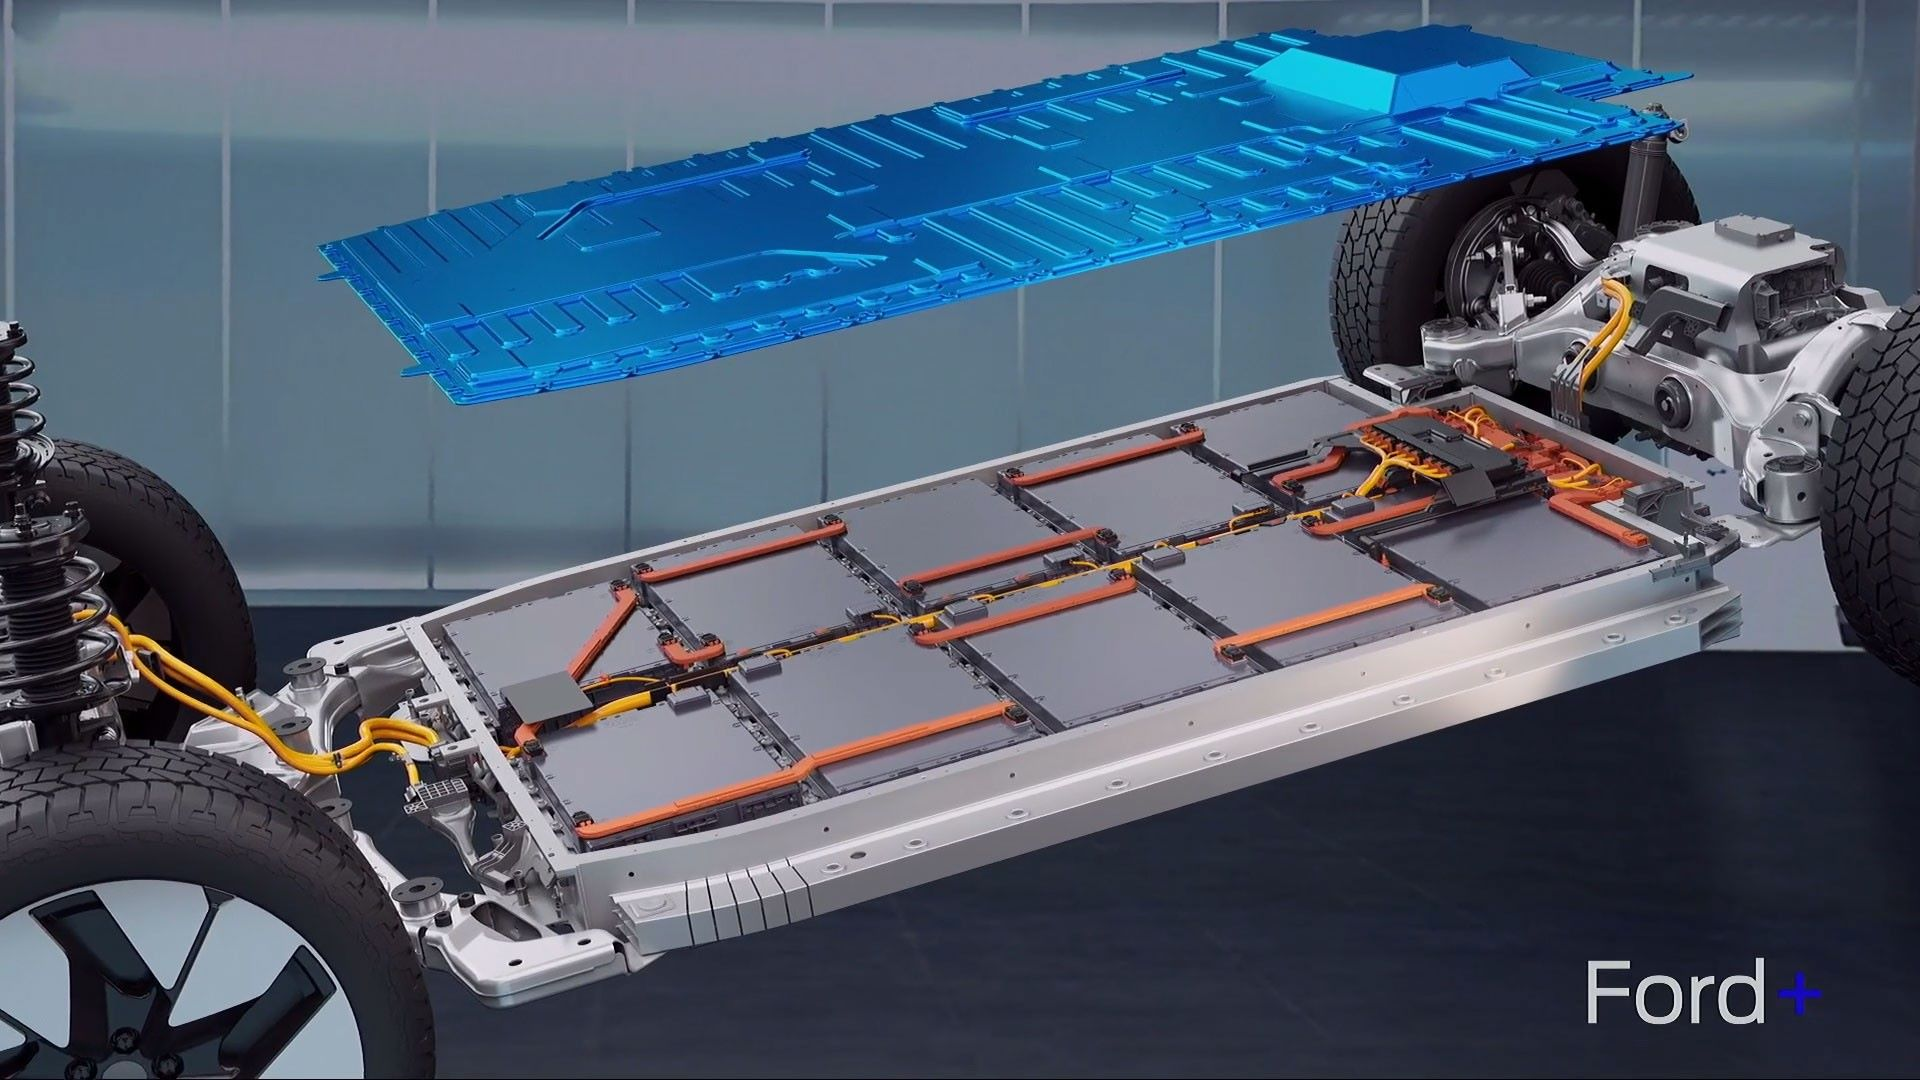 Ford-ev-platforms-2